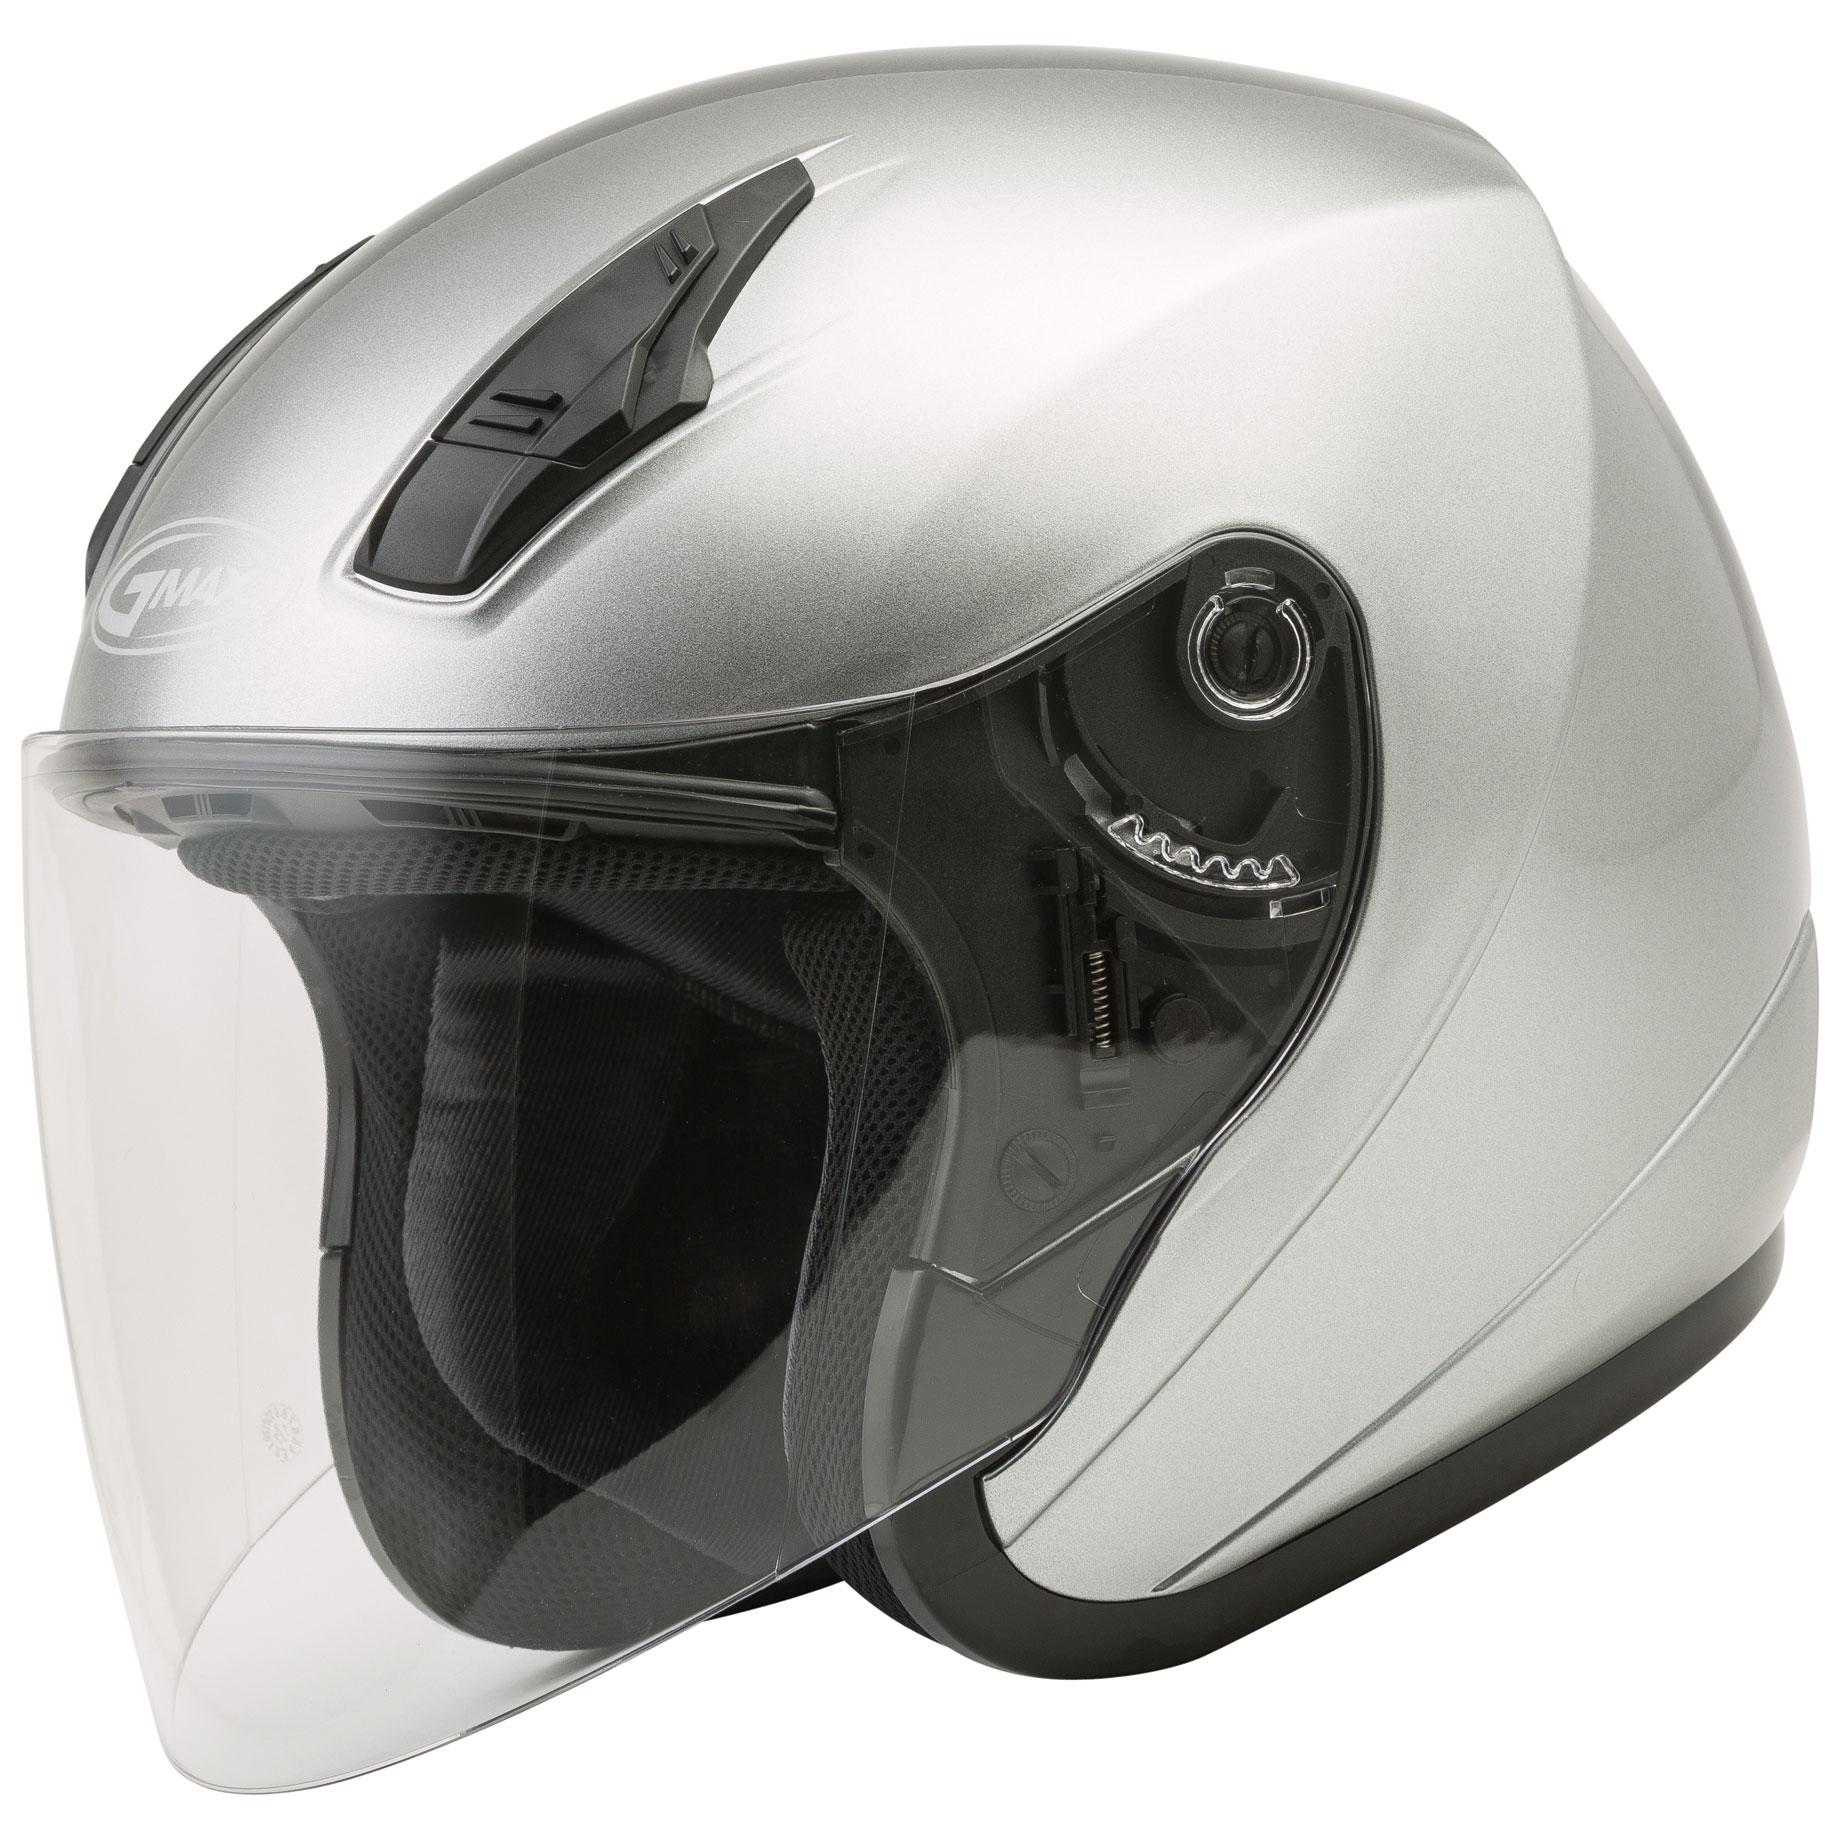 GMAX OF17 Dark Silver Open Face Helmet